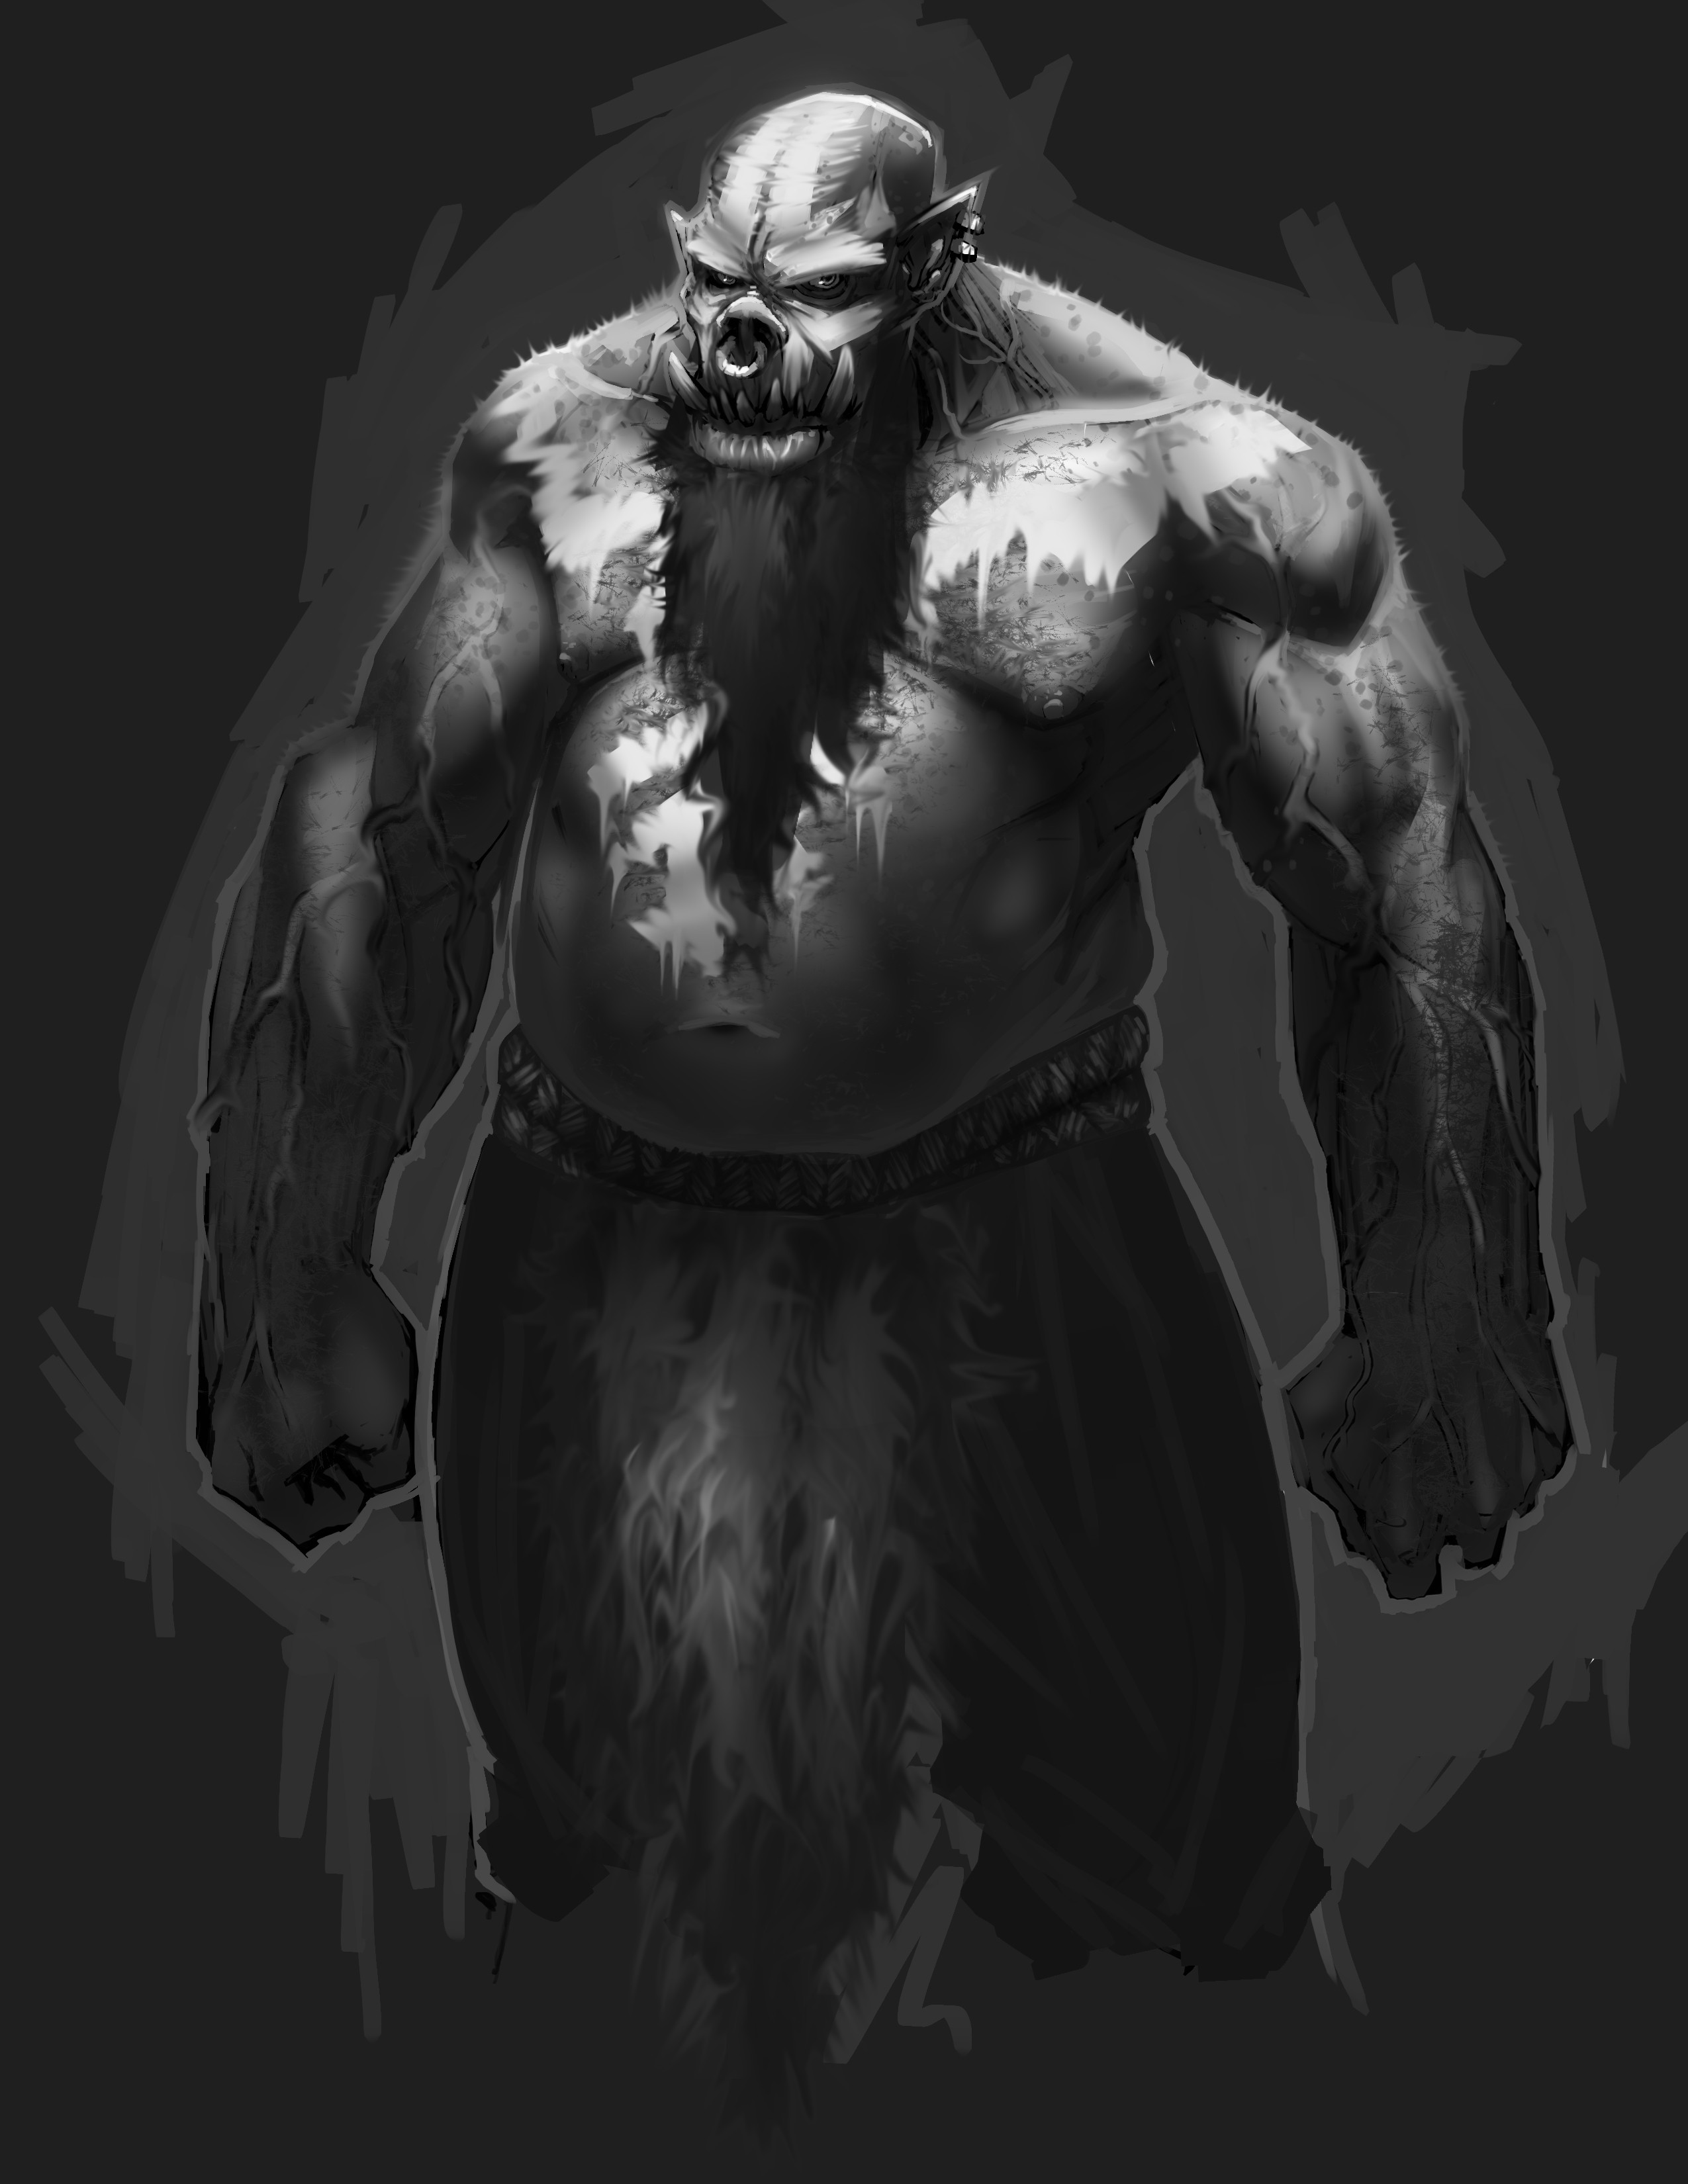 Base character with warpaint, dark beard and loincloth